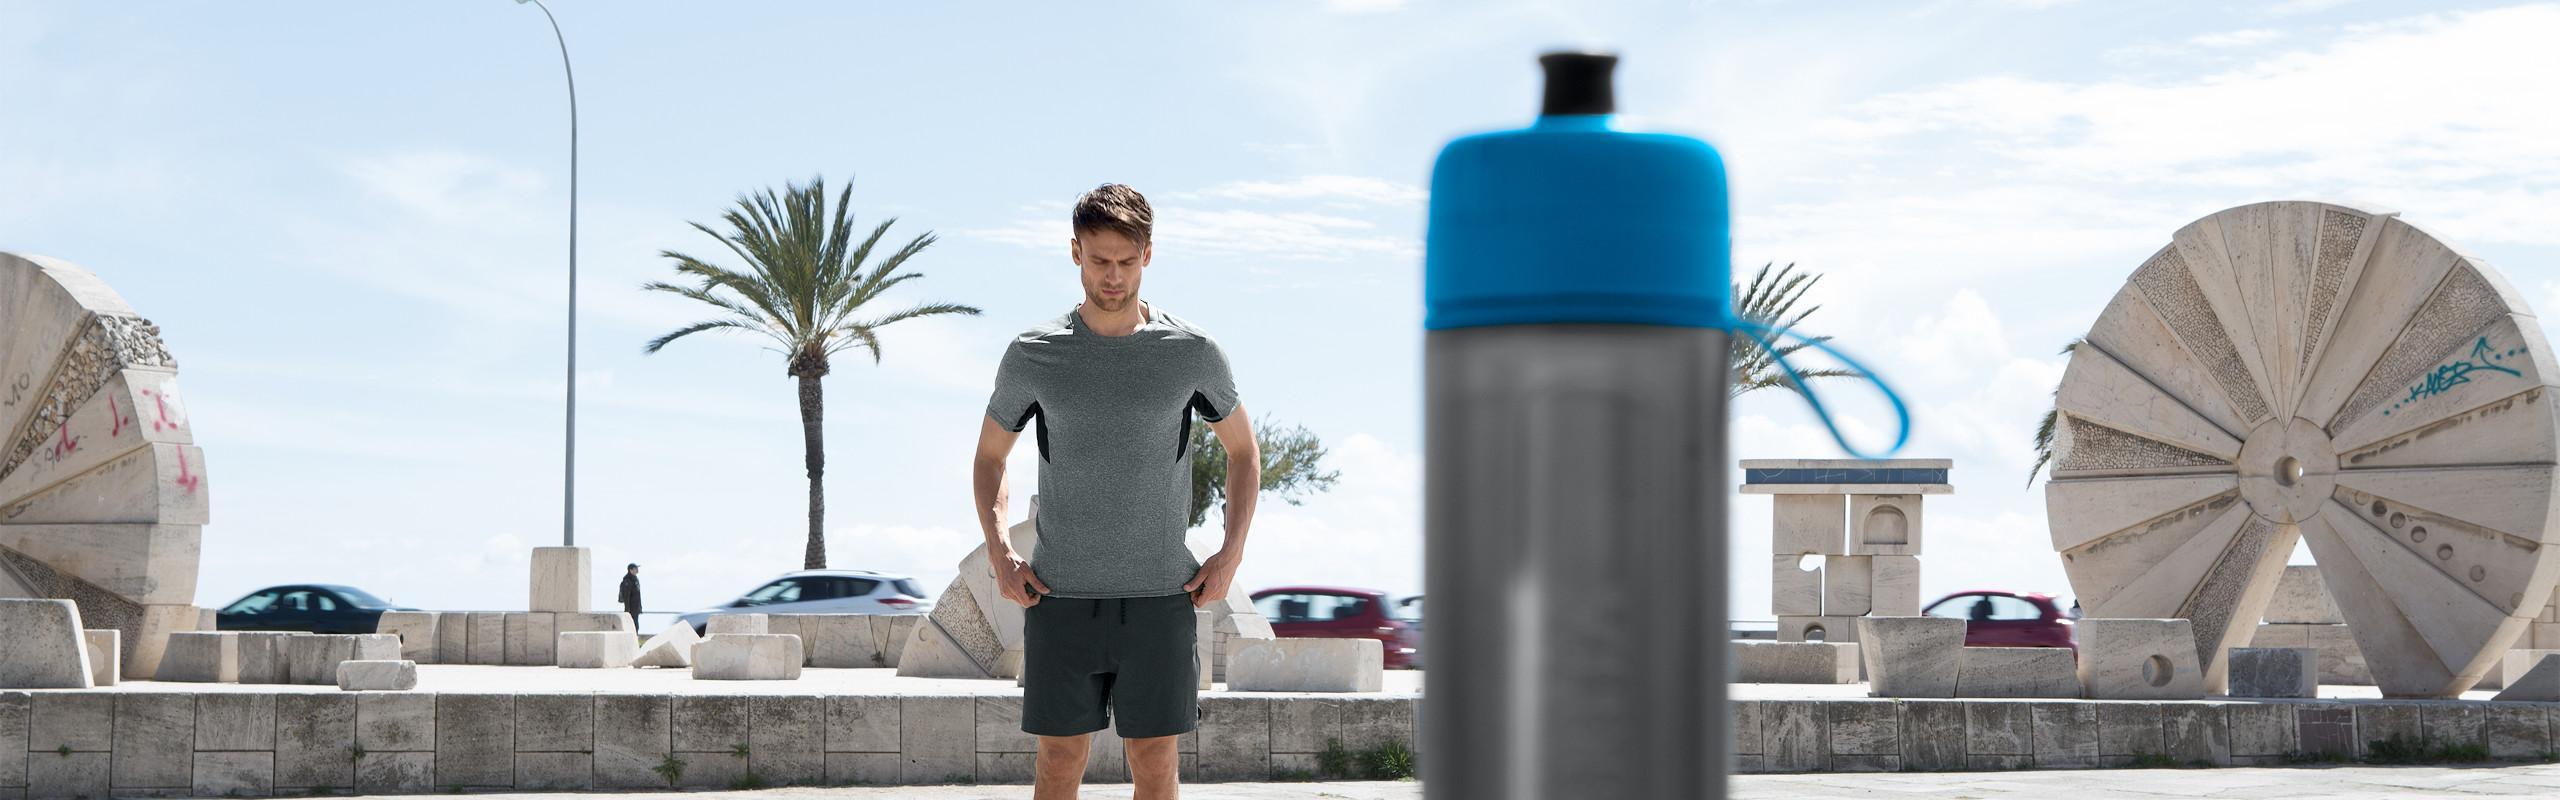 Man in background with BRITA Active blue